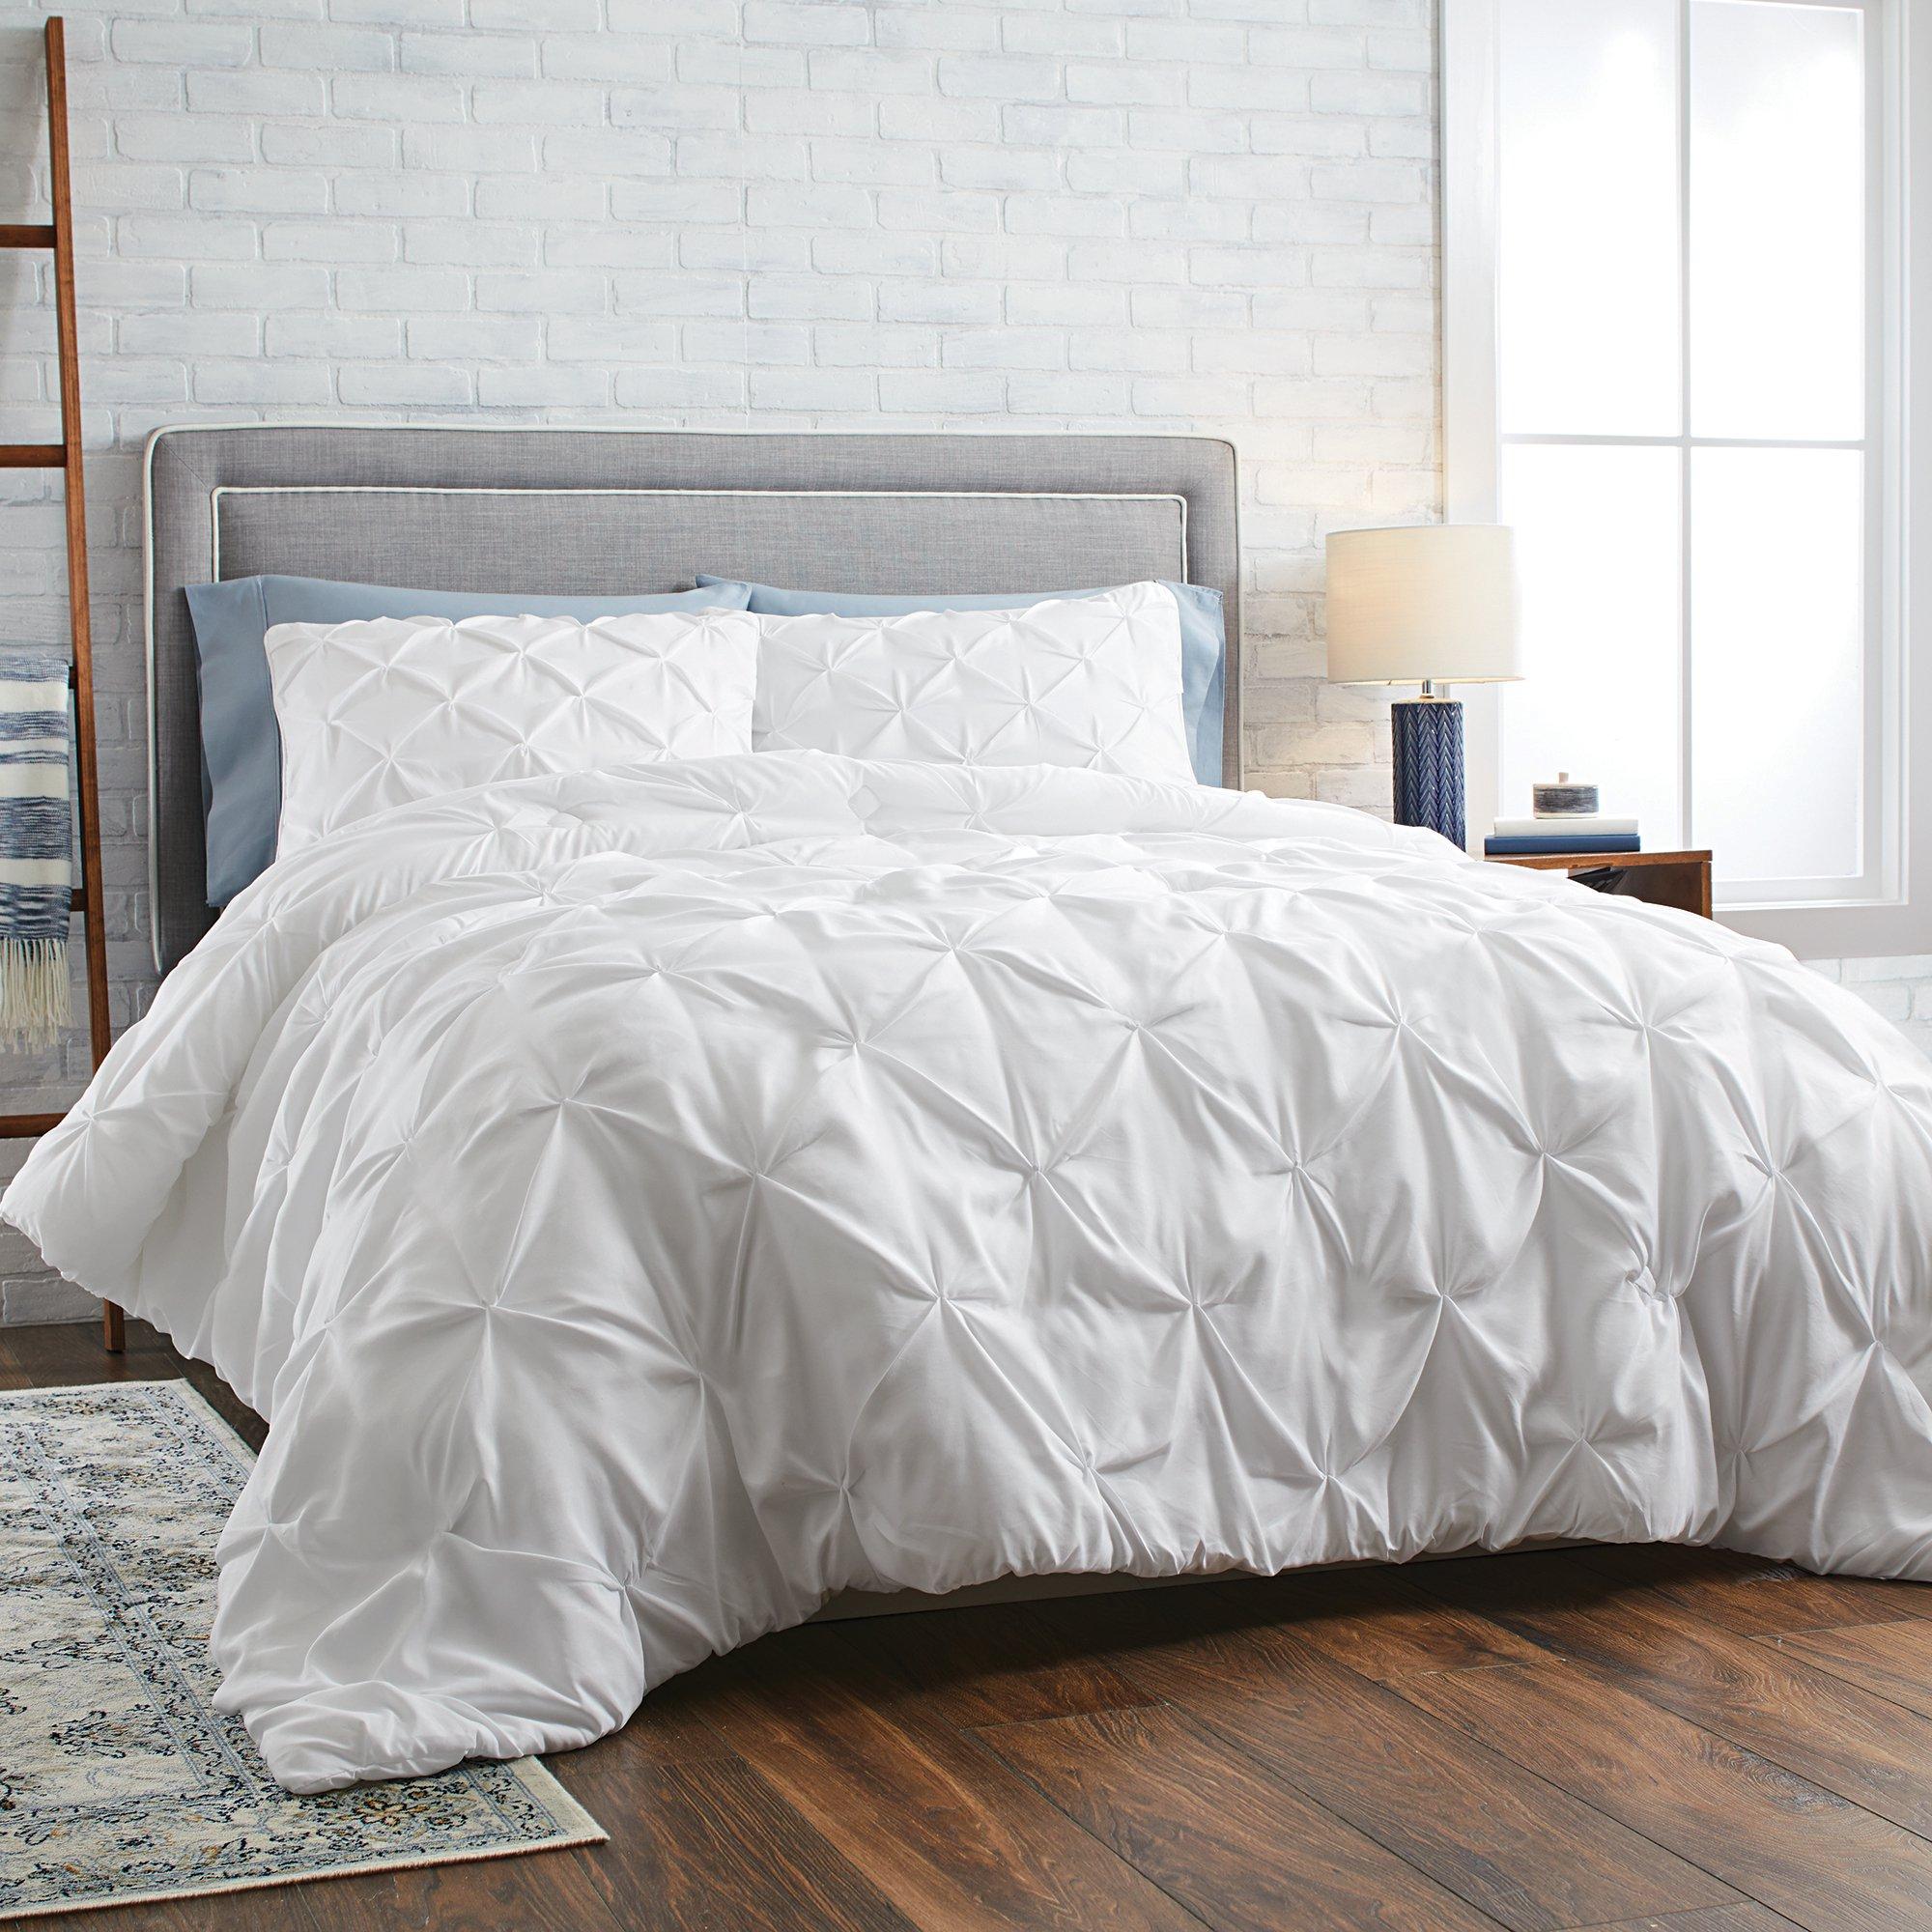 Better Homes & Gardens Full or Queen Pintuck Comforter Set, 3 Piece